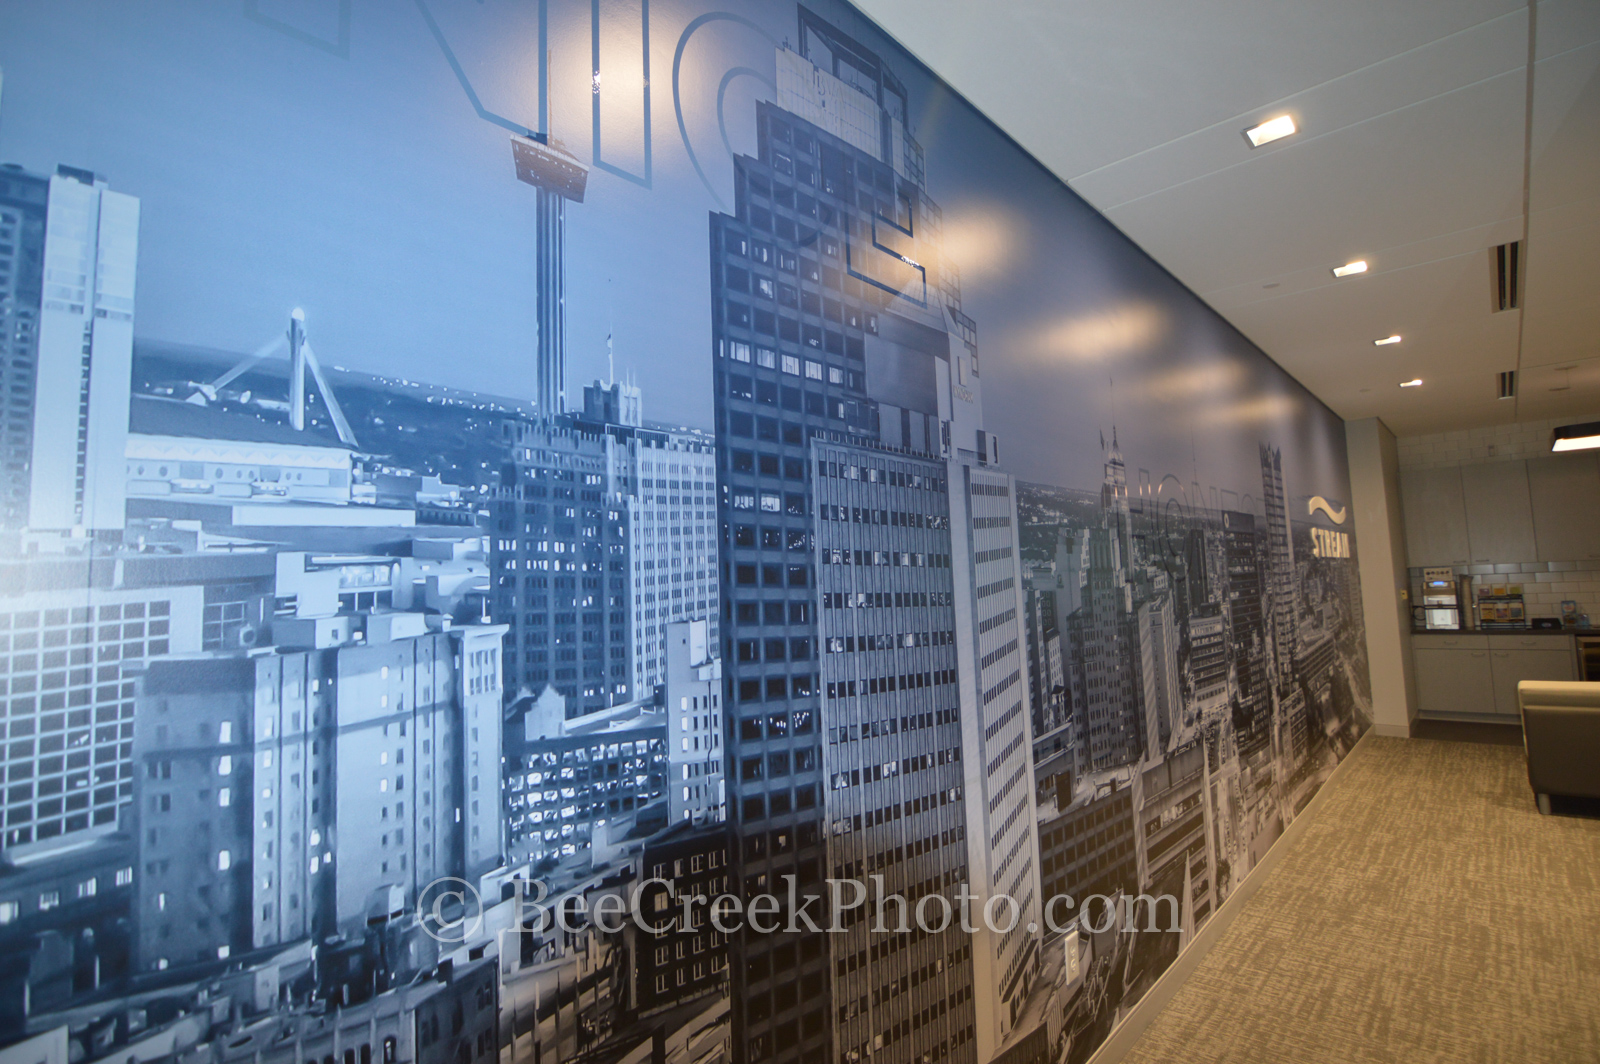 wall mural, print, large print, large wall mural, photo